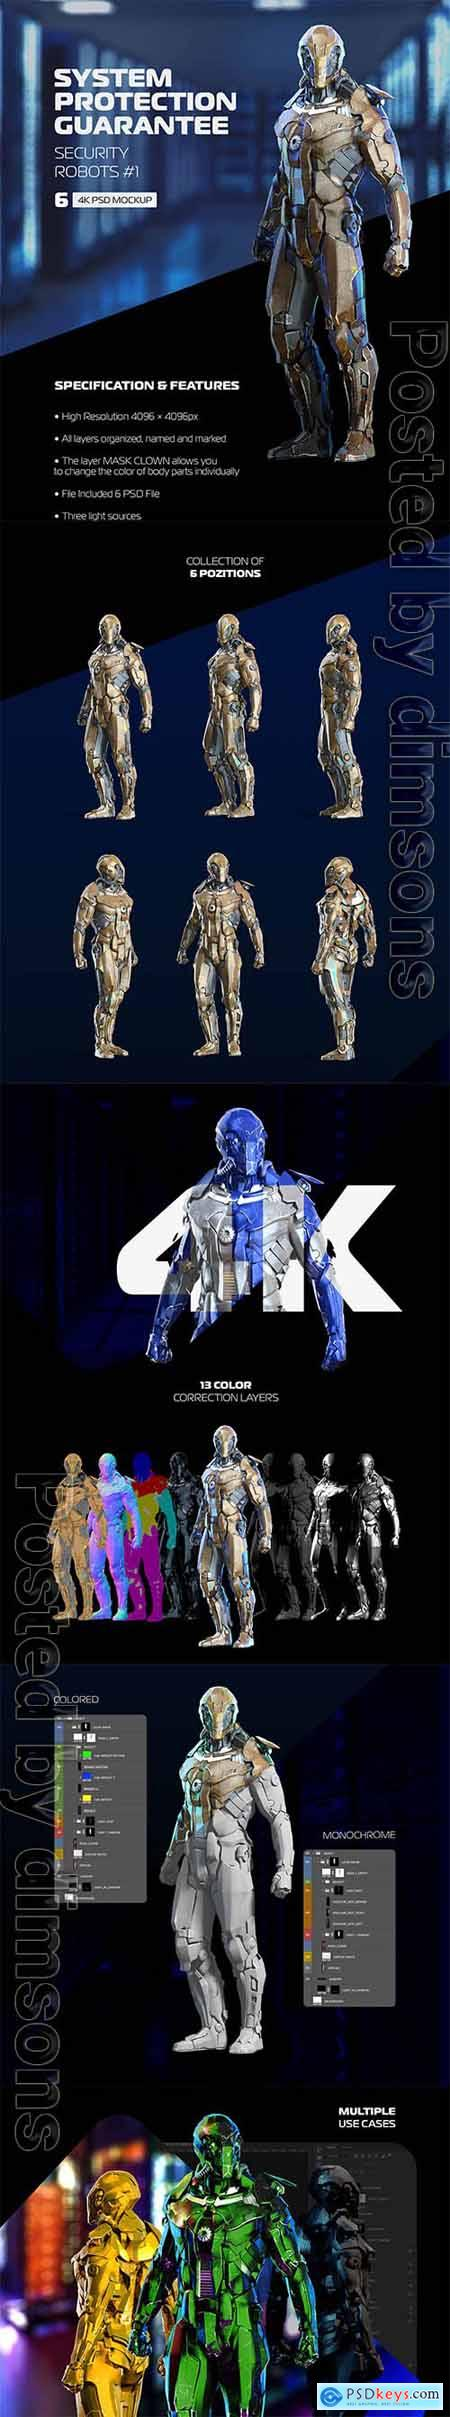 Security Robots #1 66025